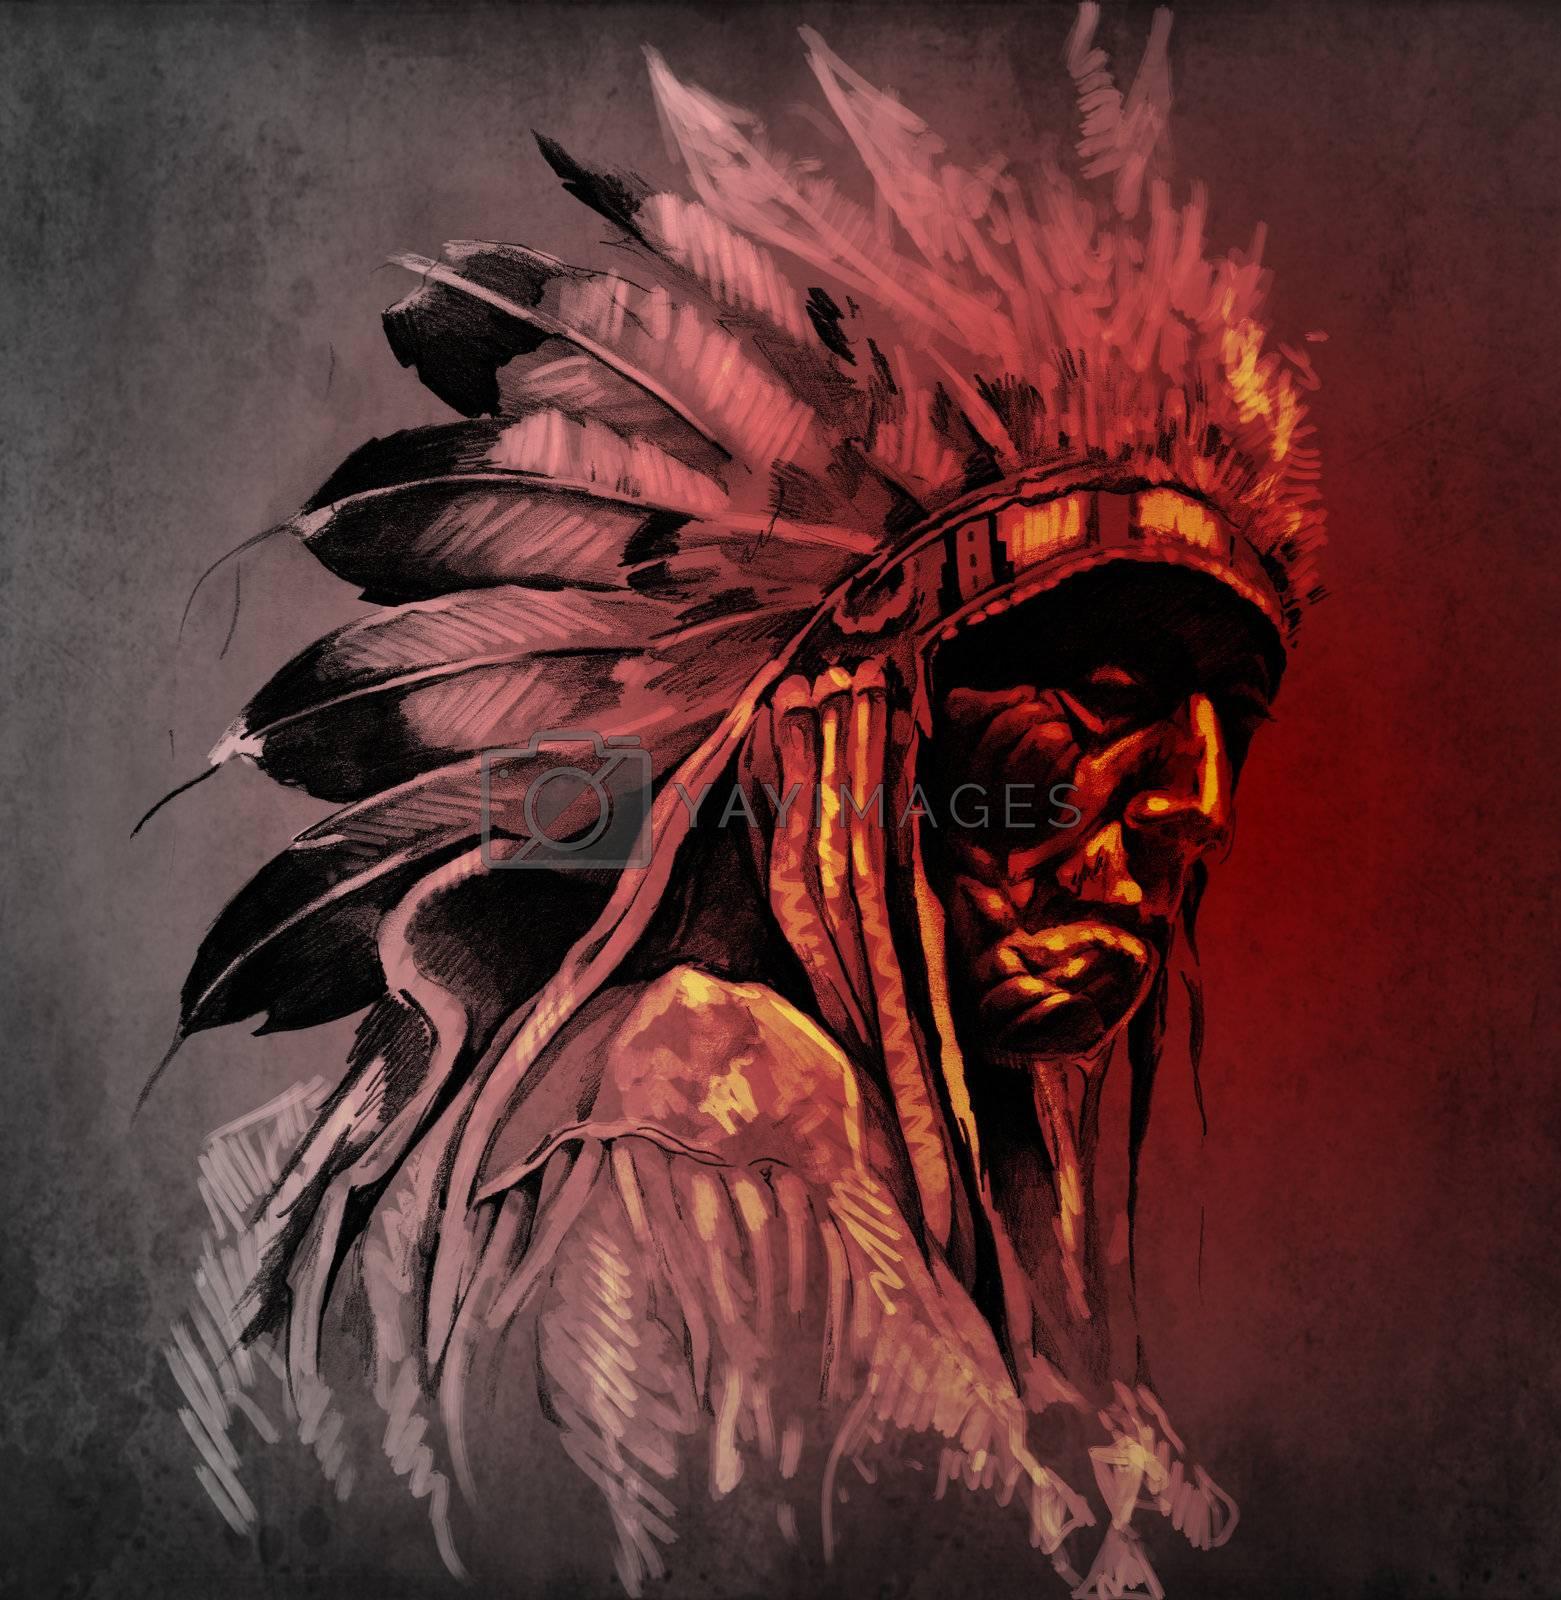 Tattoo art, portrait of american indian head over dark background